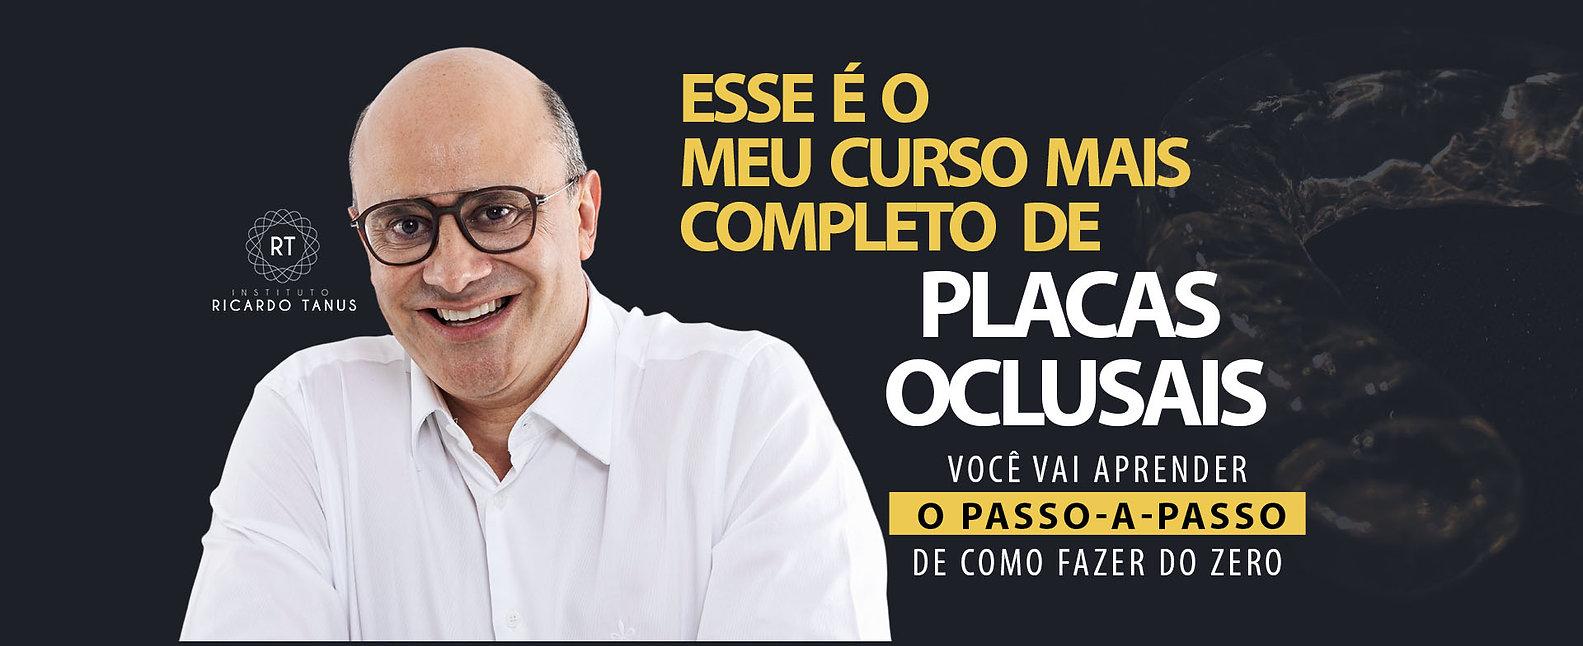 pagina-nova-placa_cópia.jpg